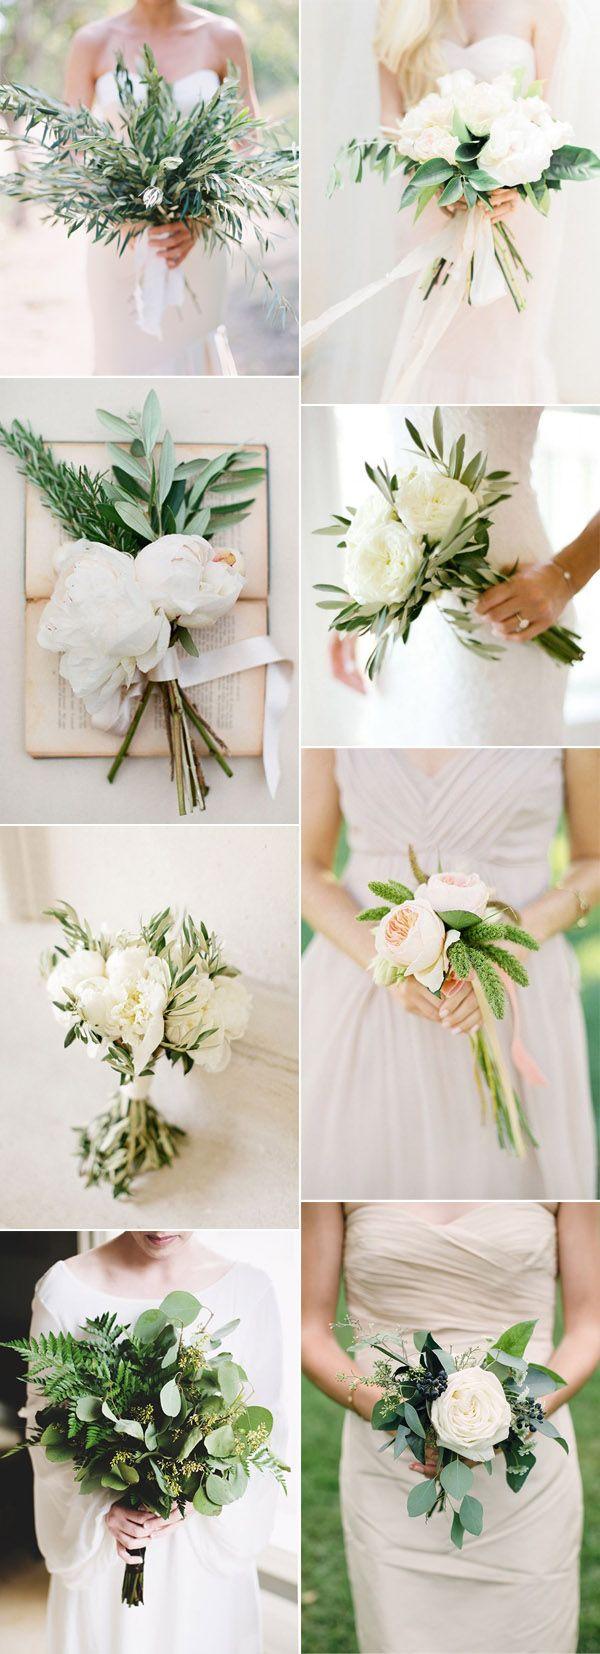 2017 trends easy diy organic minimalist wedding ideas minimalism weddings and wedding. Black Bedroom Furniture Sets. Home Design Ideas